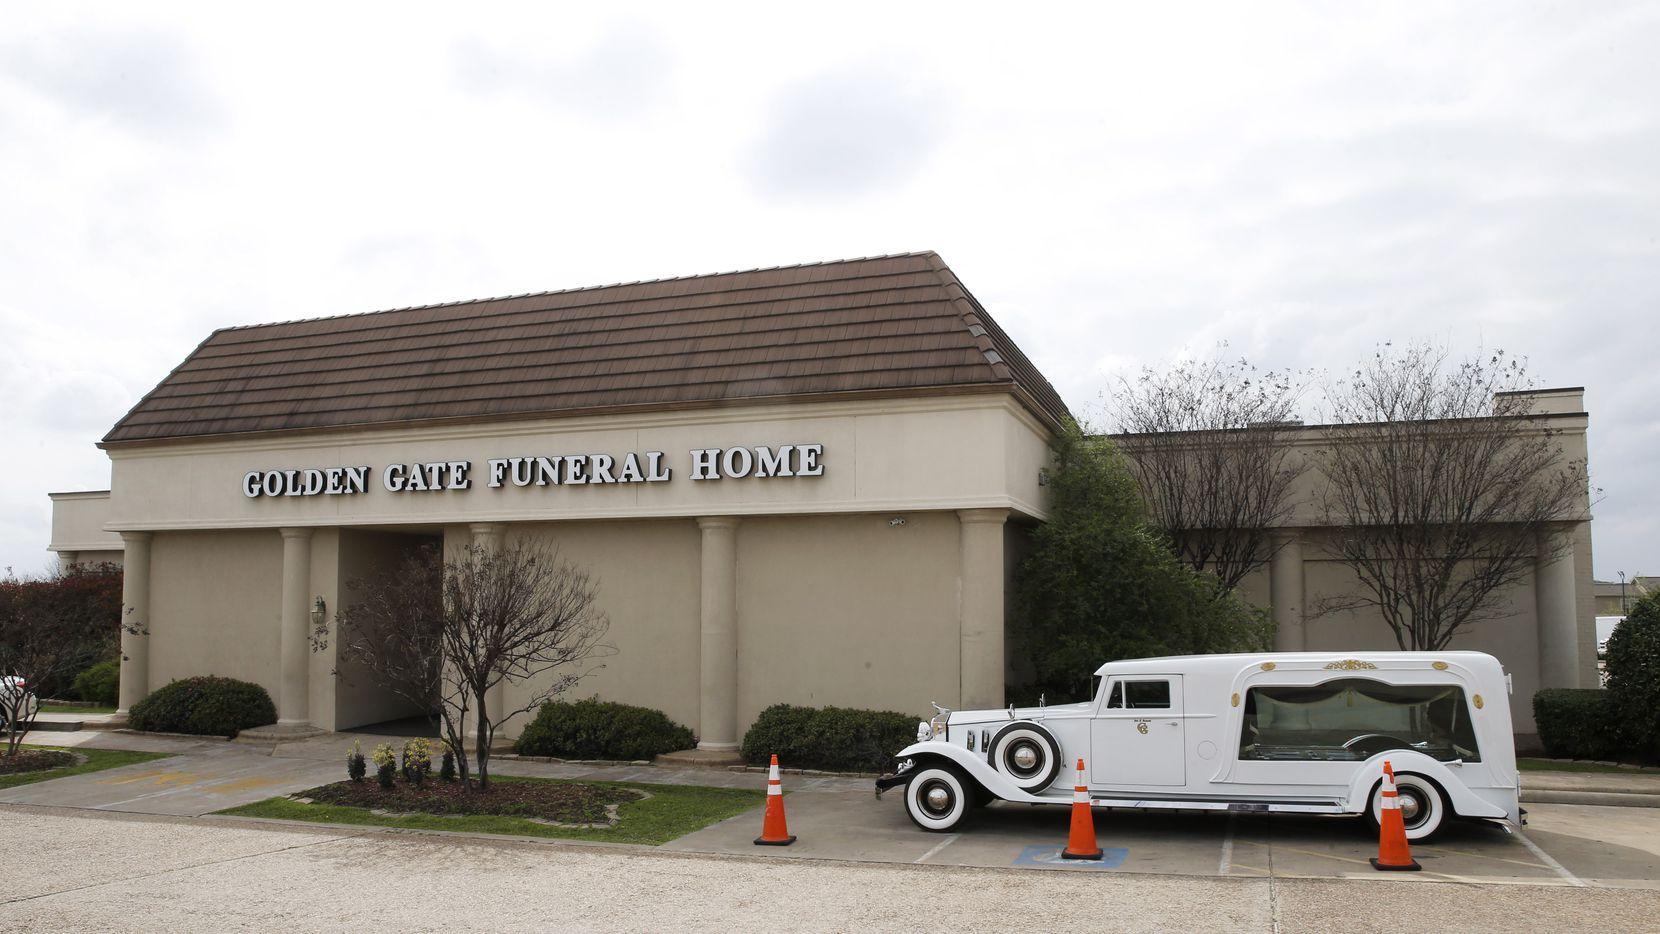 Golden Gate Funeral Home in Dallas.